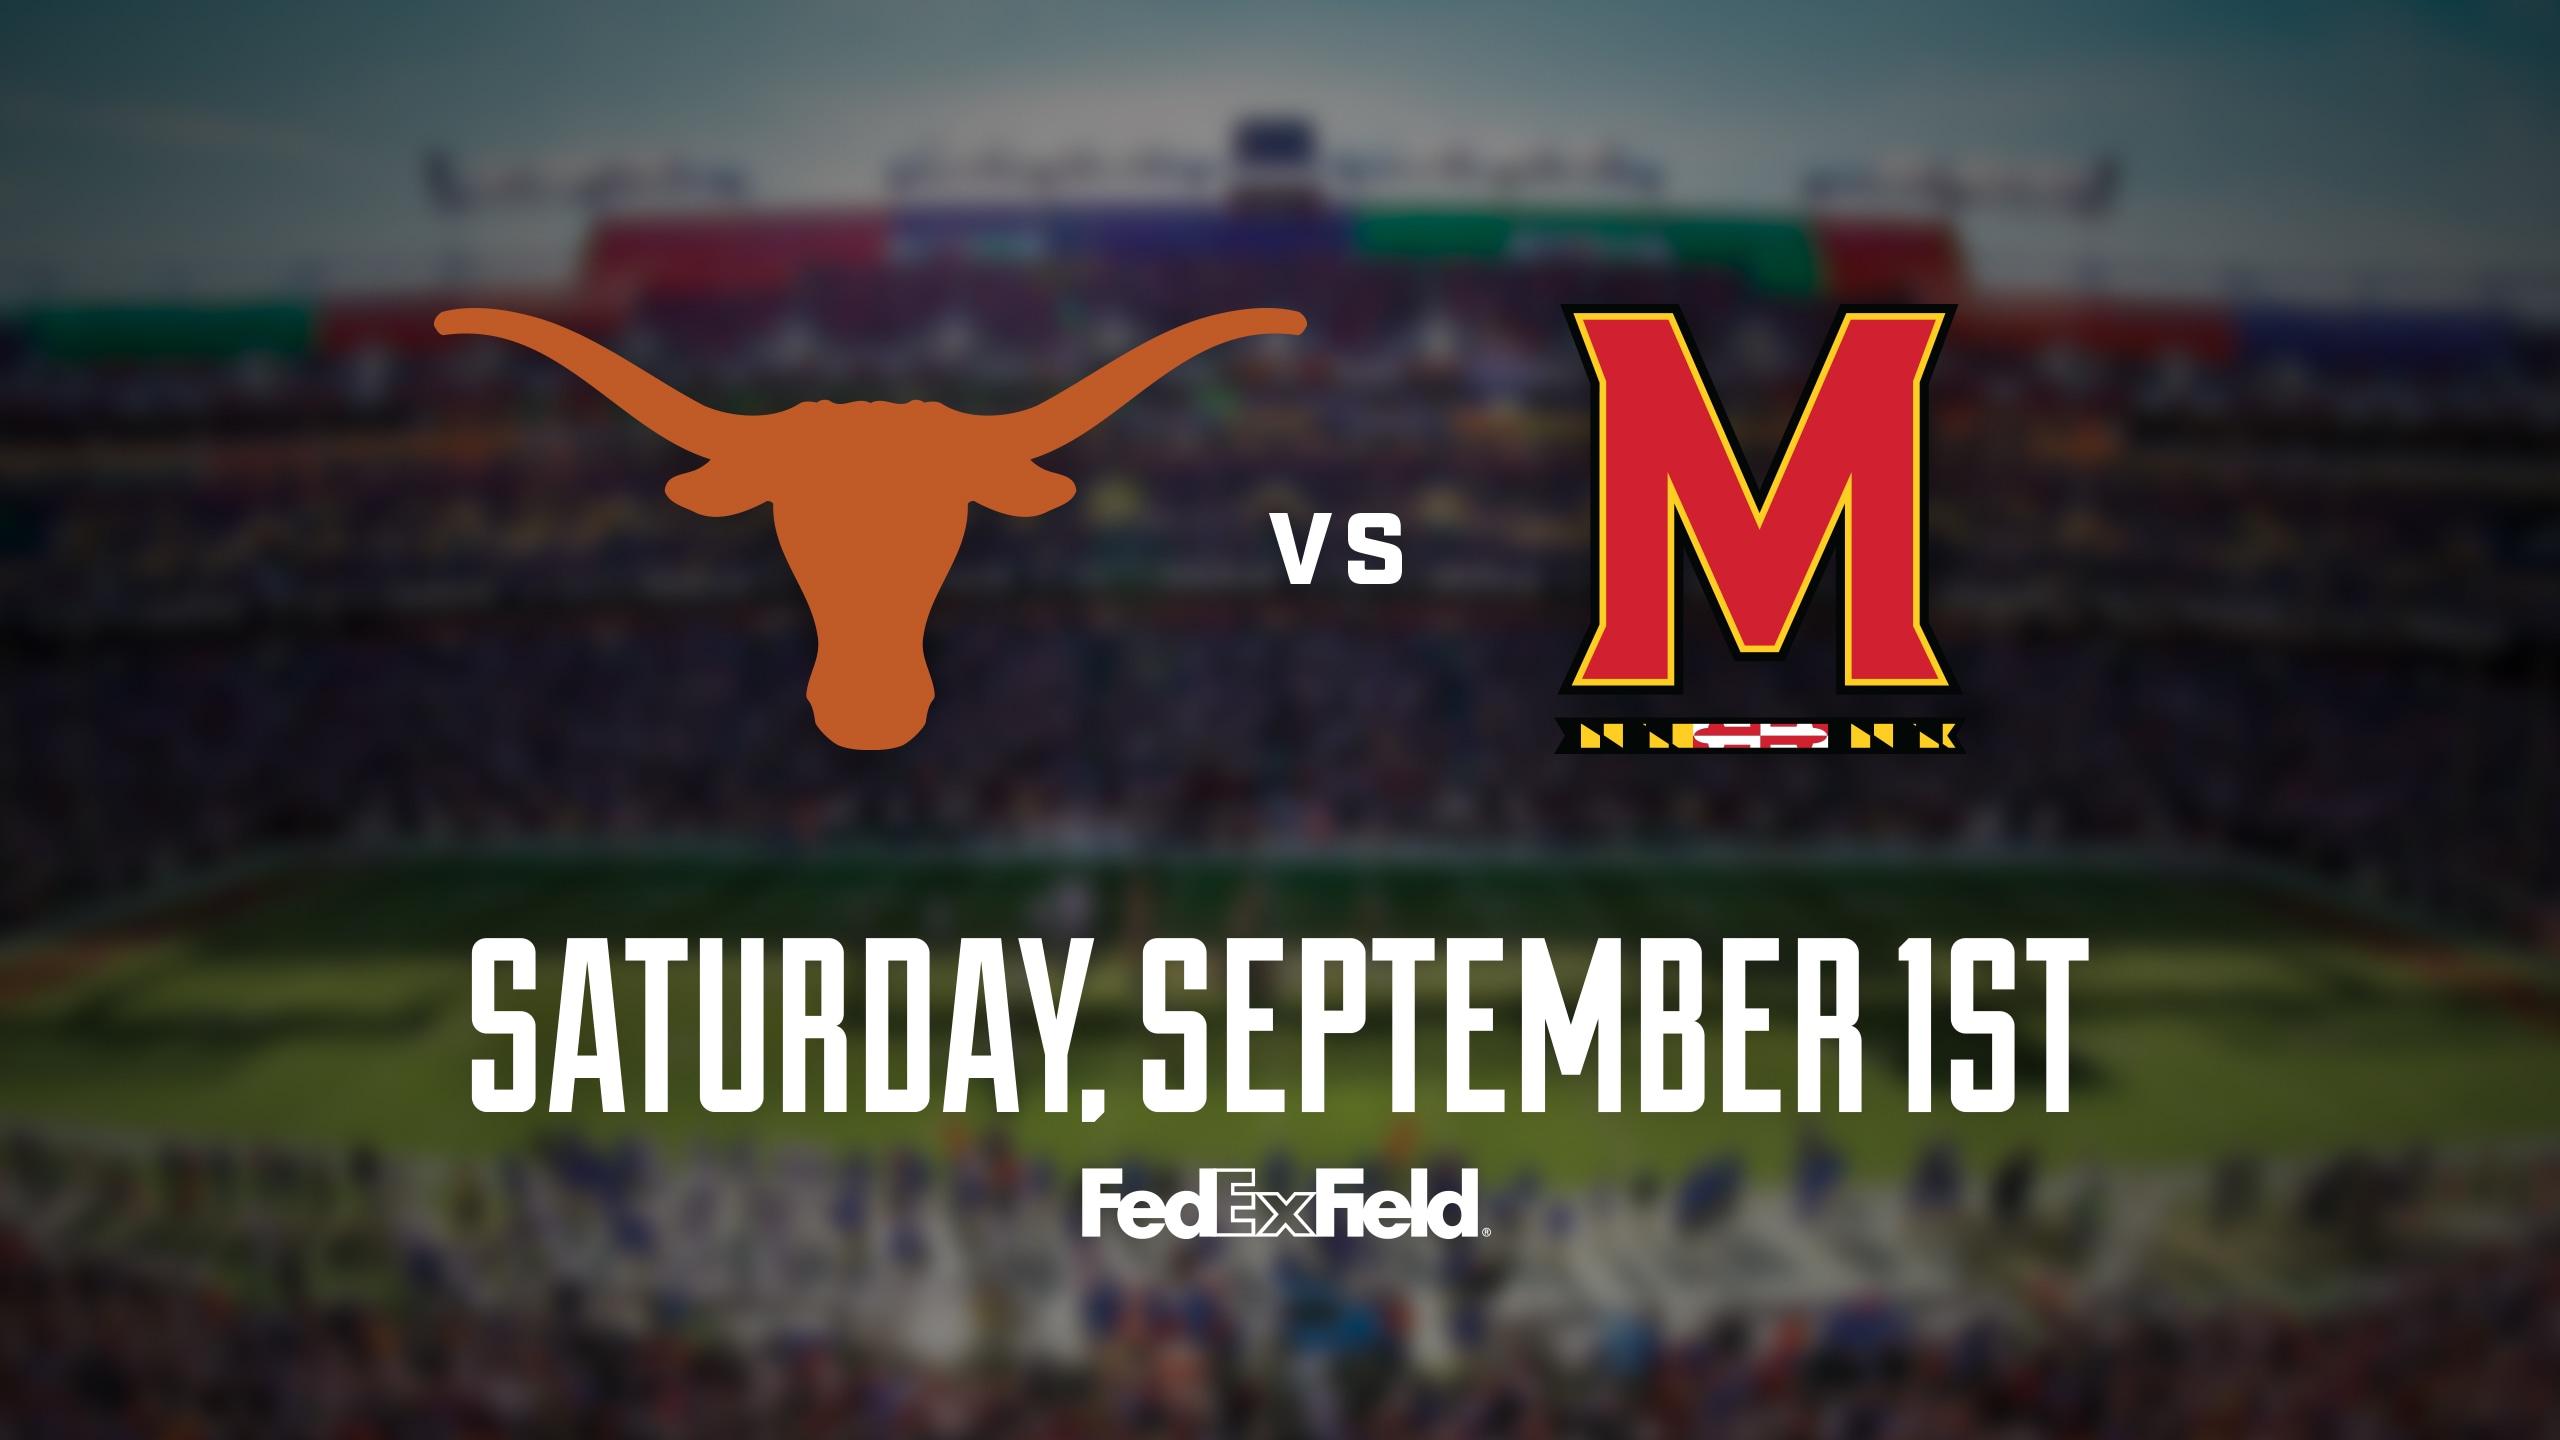 Texas Longhorns vs. Maryland Terrapins